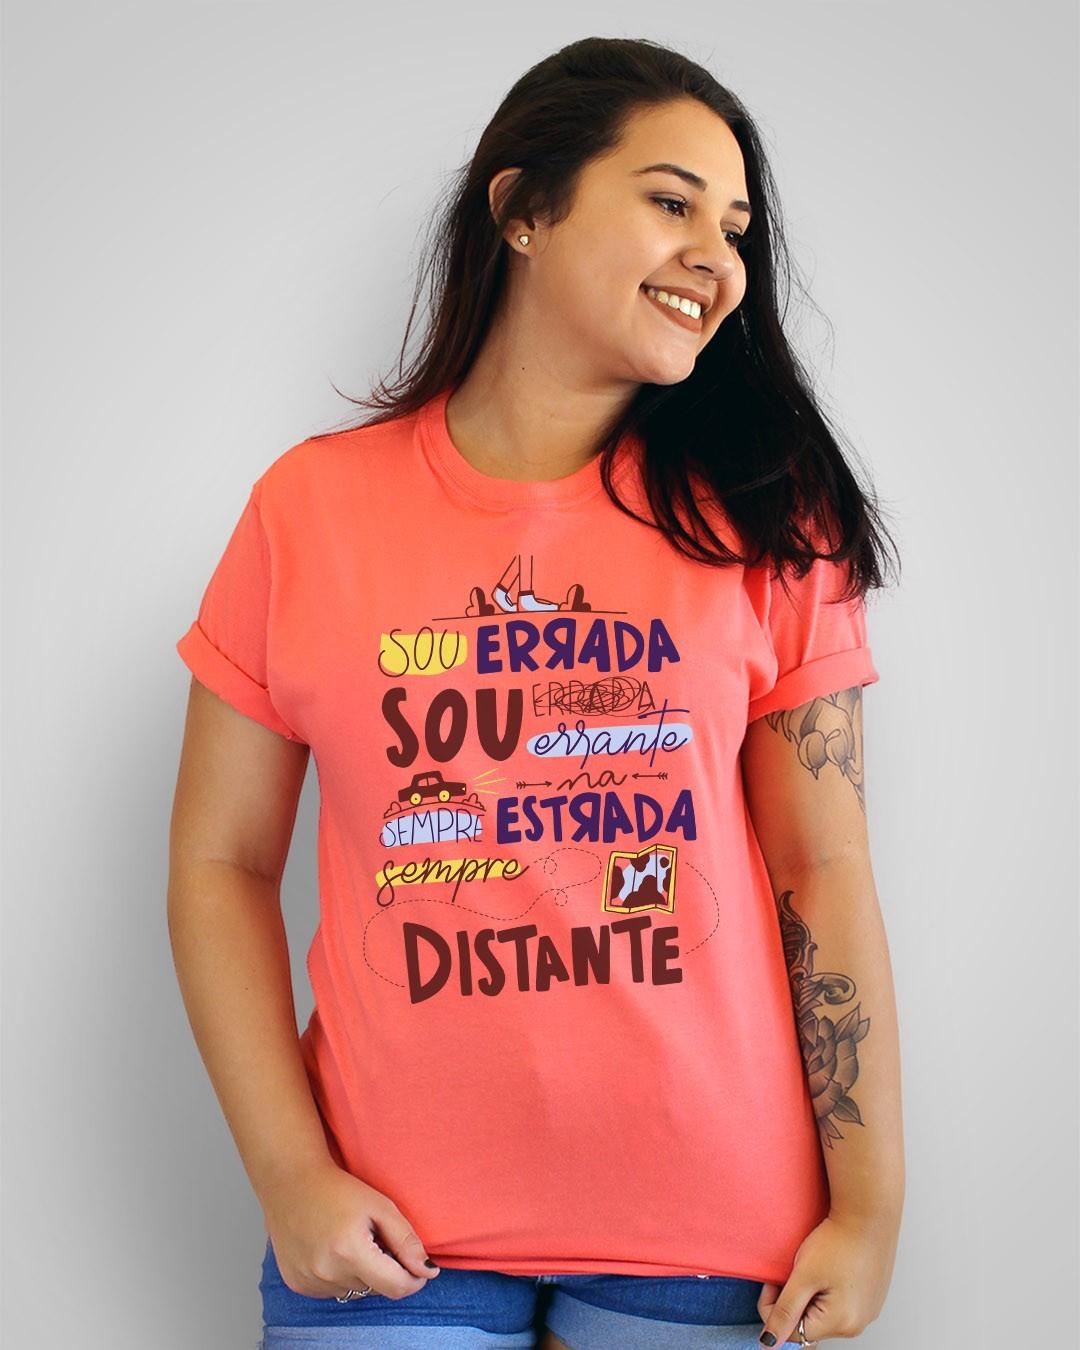 Camiseta Sou errada, sou errante, sempre na estrada, sempre distante - Kid Abelha